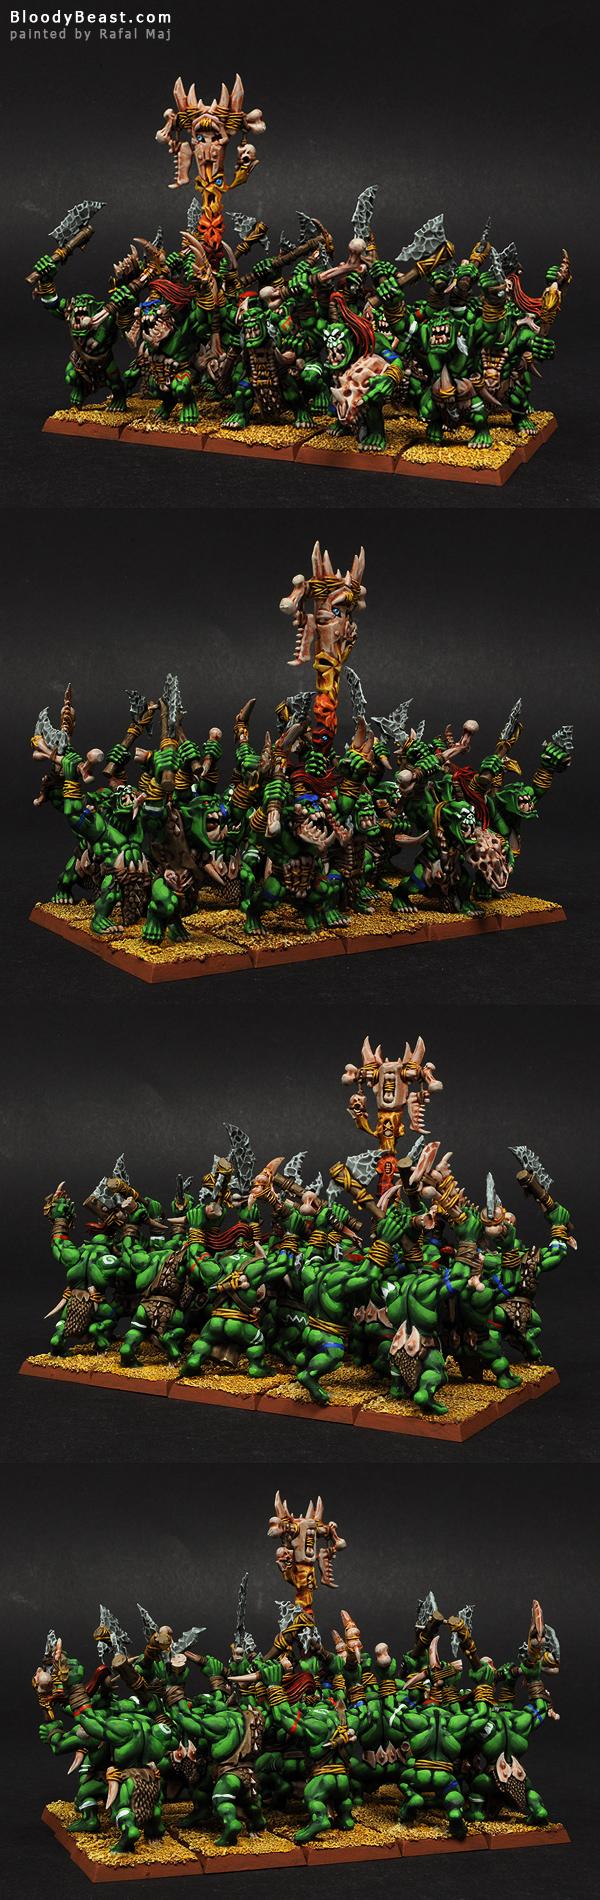 Savage Orcs painted by Rafal Maj (BloodyBeast.com)